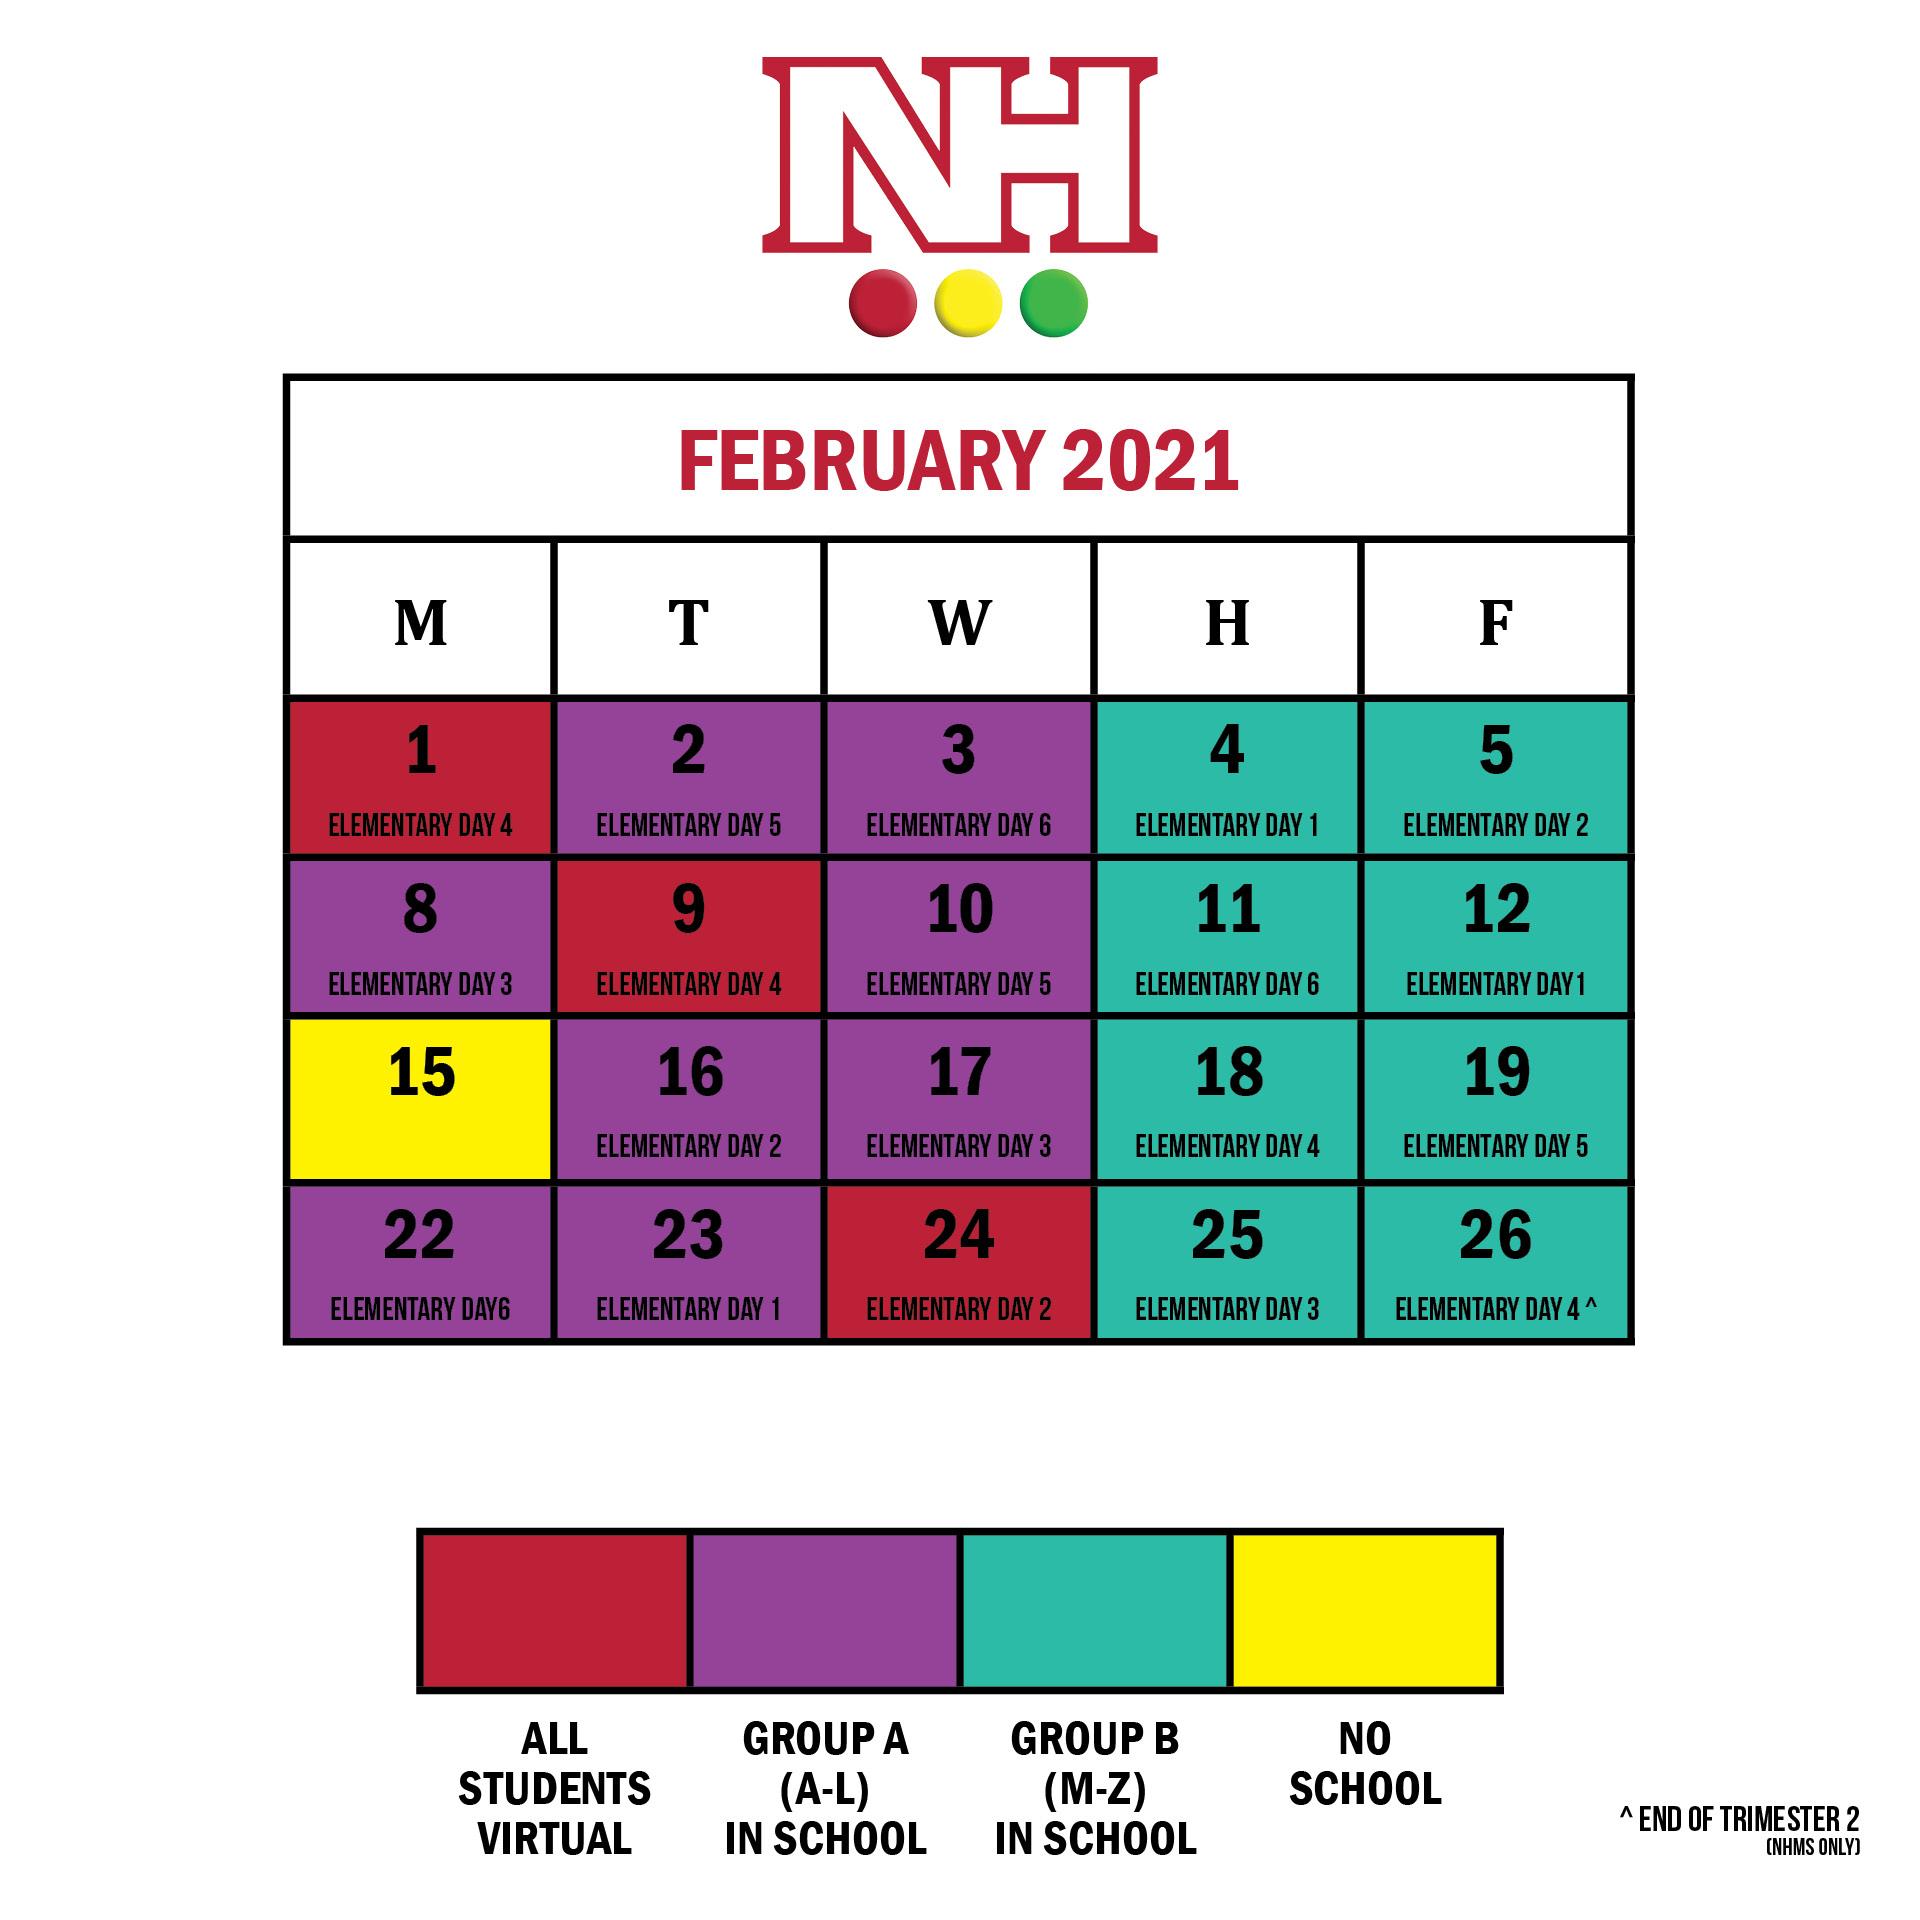 Revised February 2021 calendar